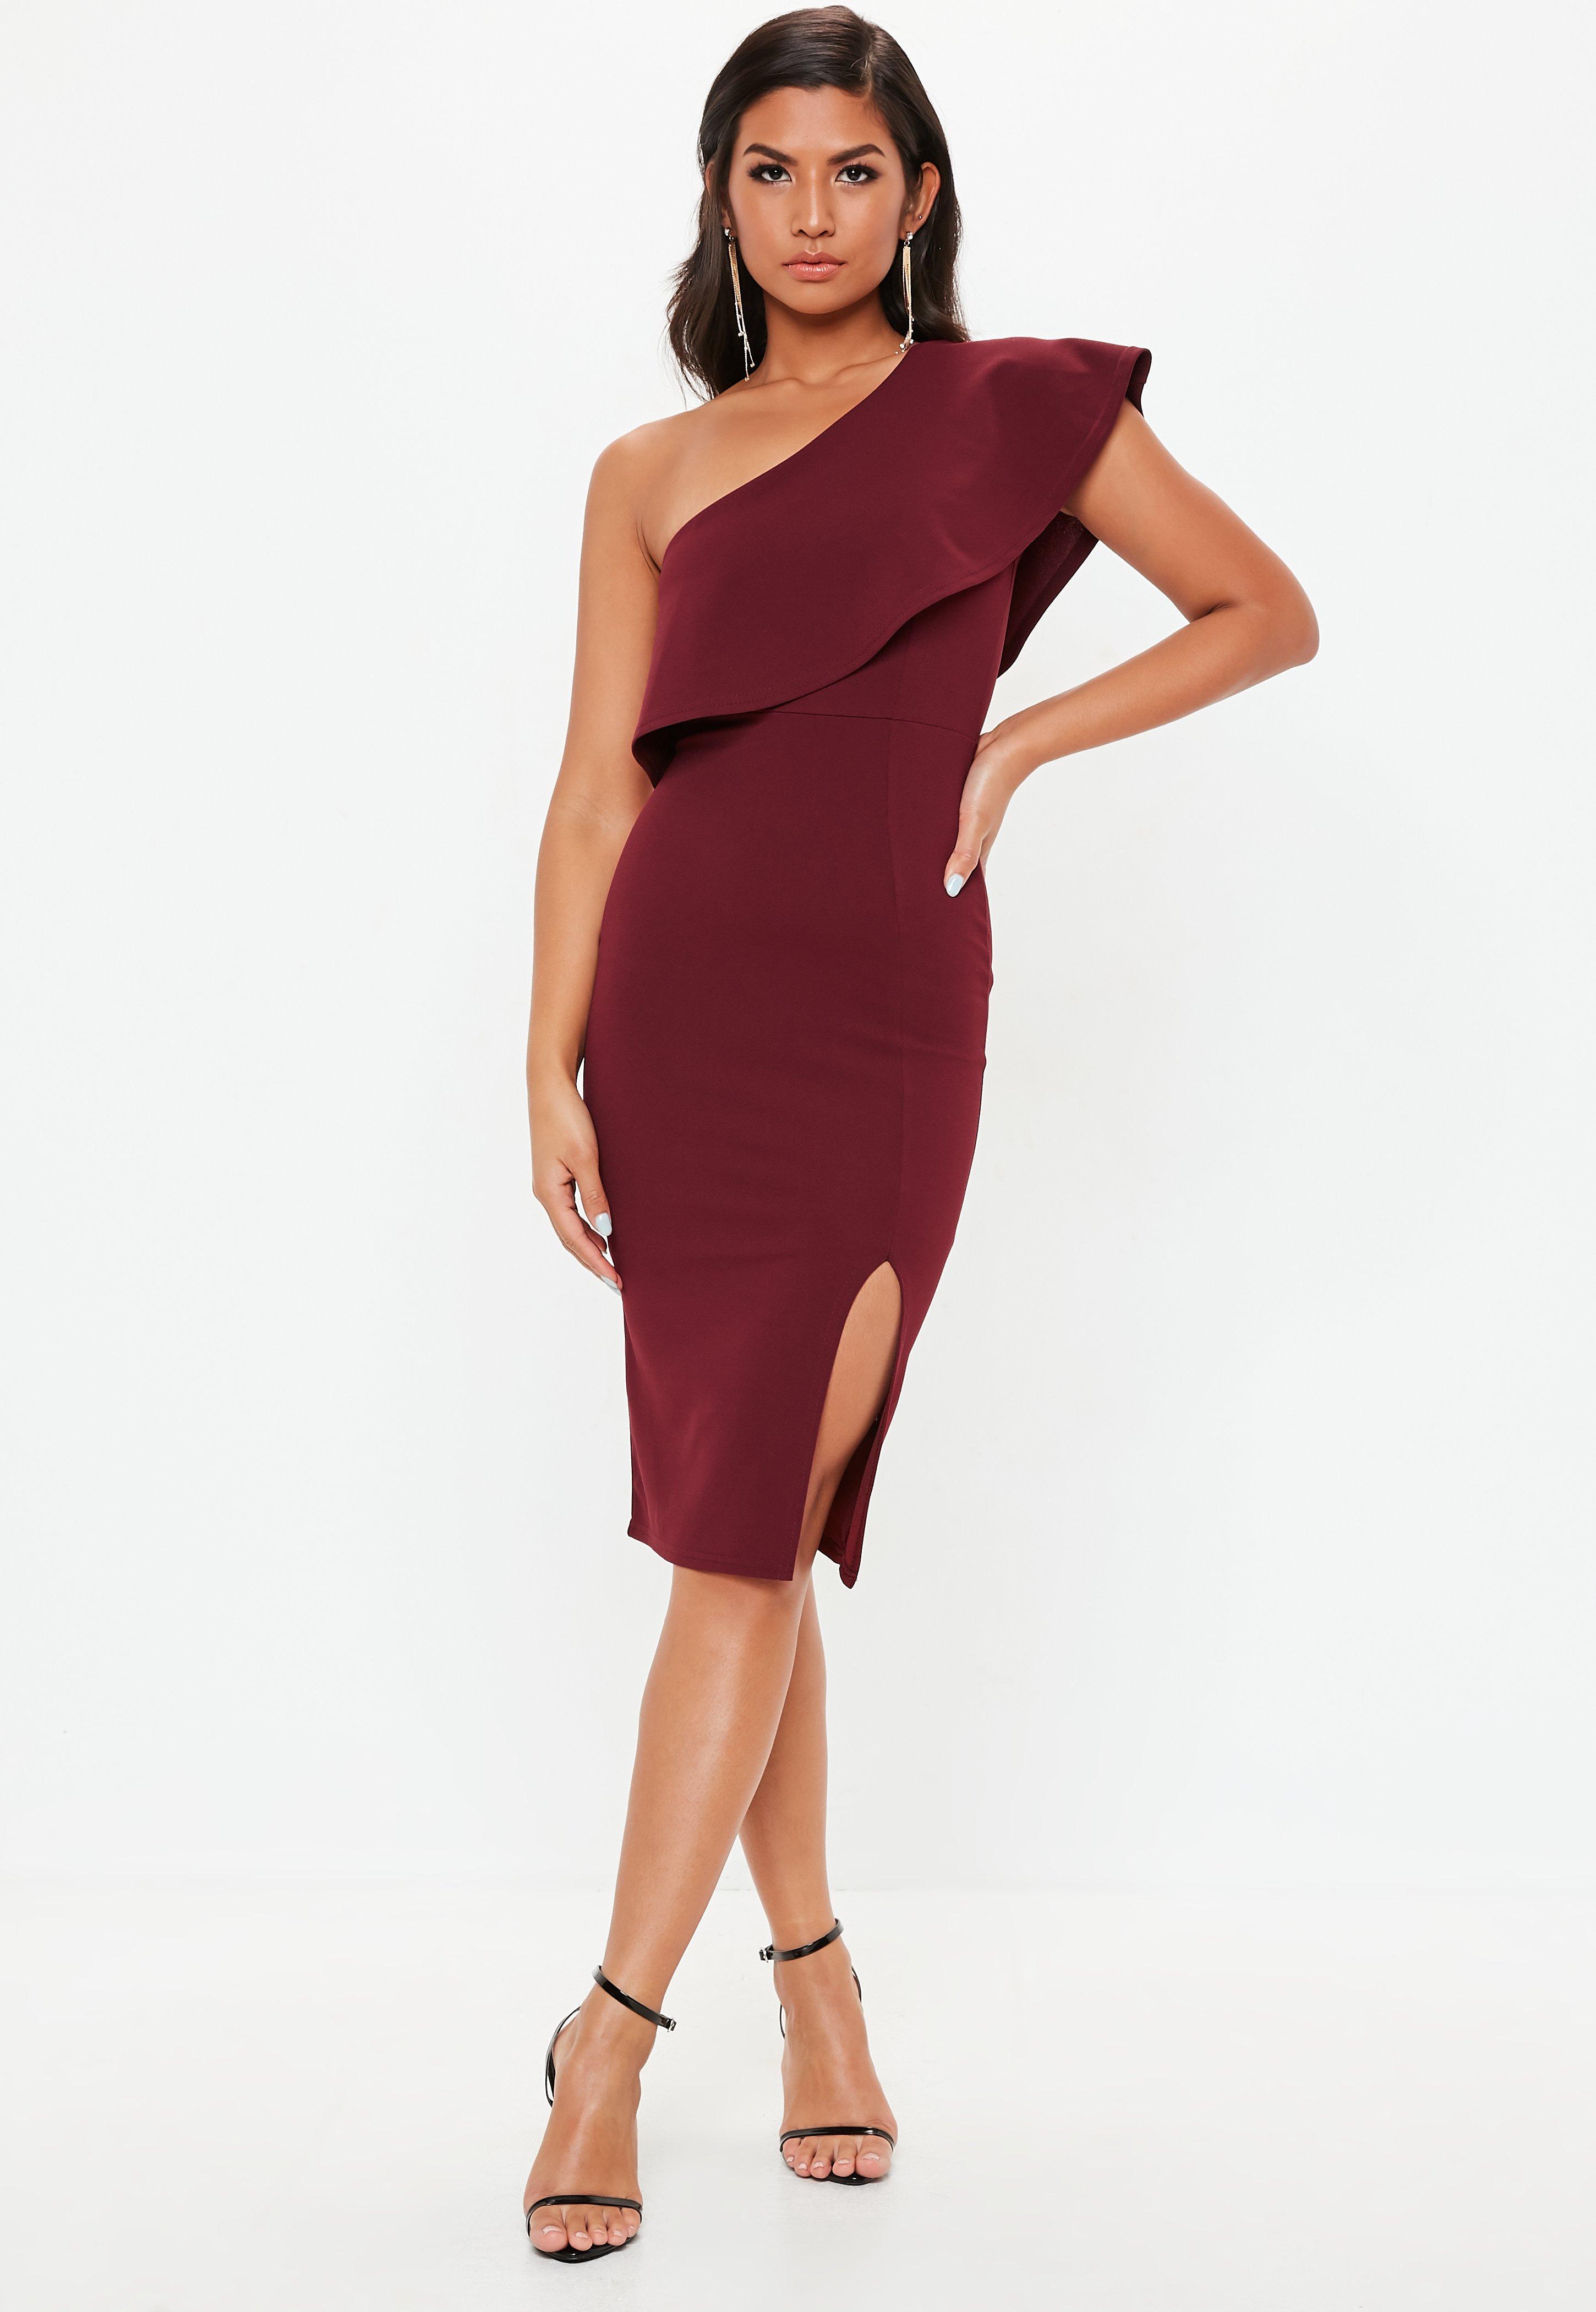 1043ad2998af4 ... Burgundy Scuba One Shoulder Midi Dress - Lyst. View fullscreen